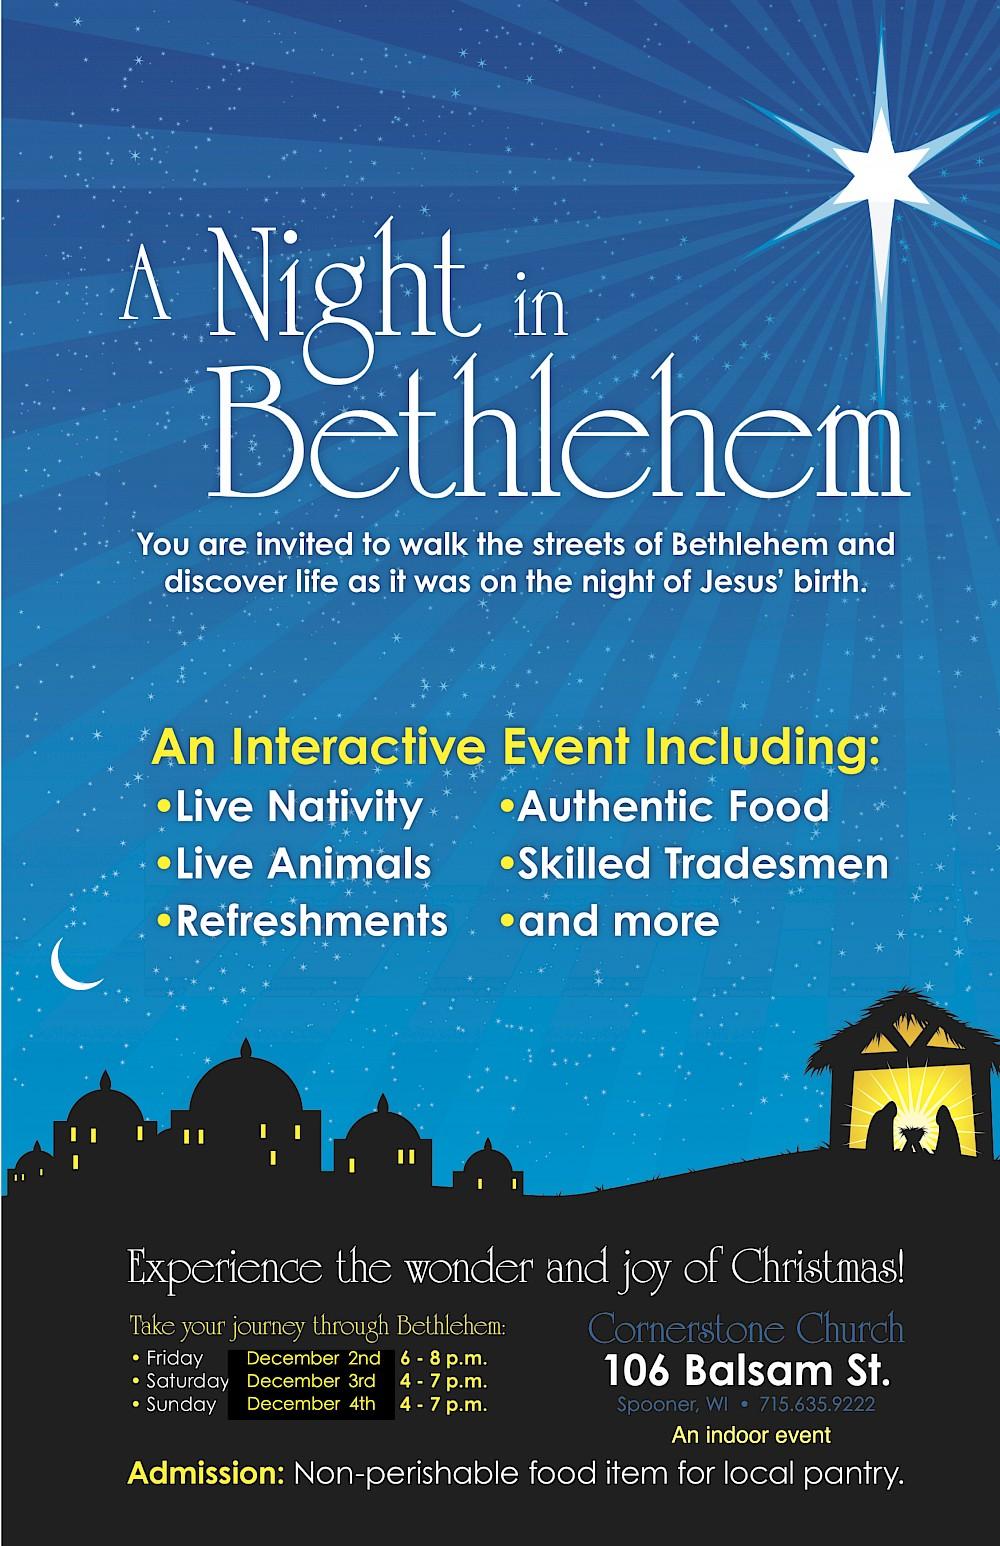 Cornerstone Church Spooner Wi Christmas Walk 2020 Cornerstone Church Hosting 'A Night in Bethlehem'   Recent News